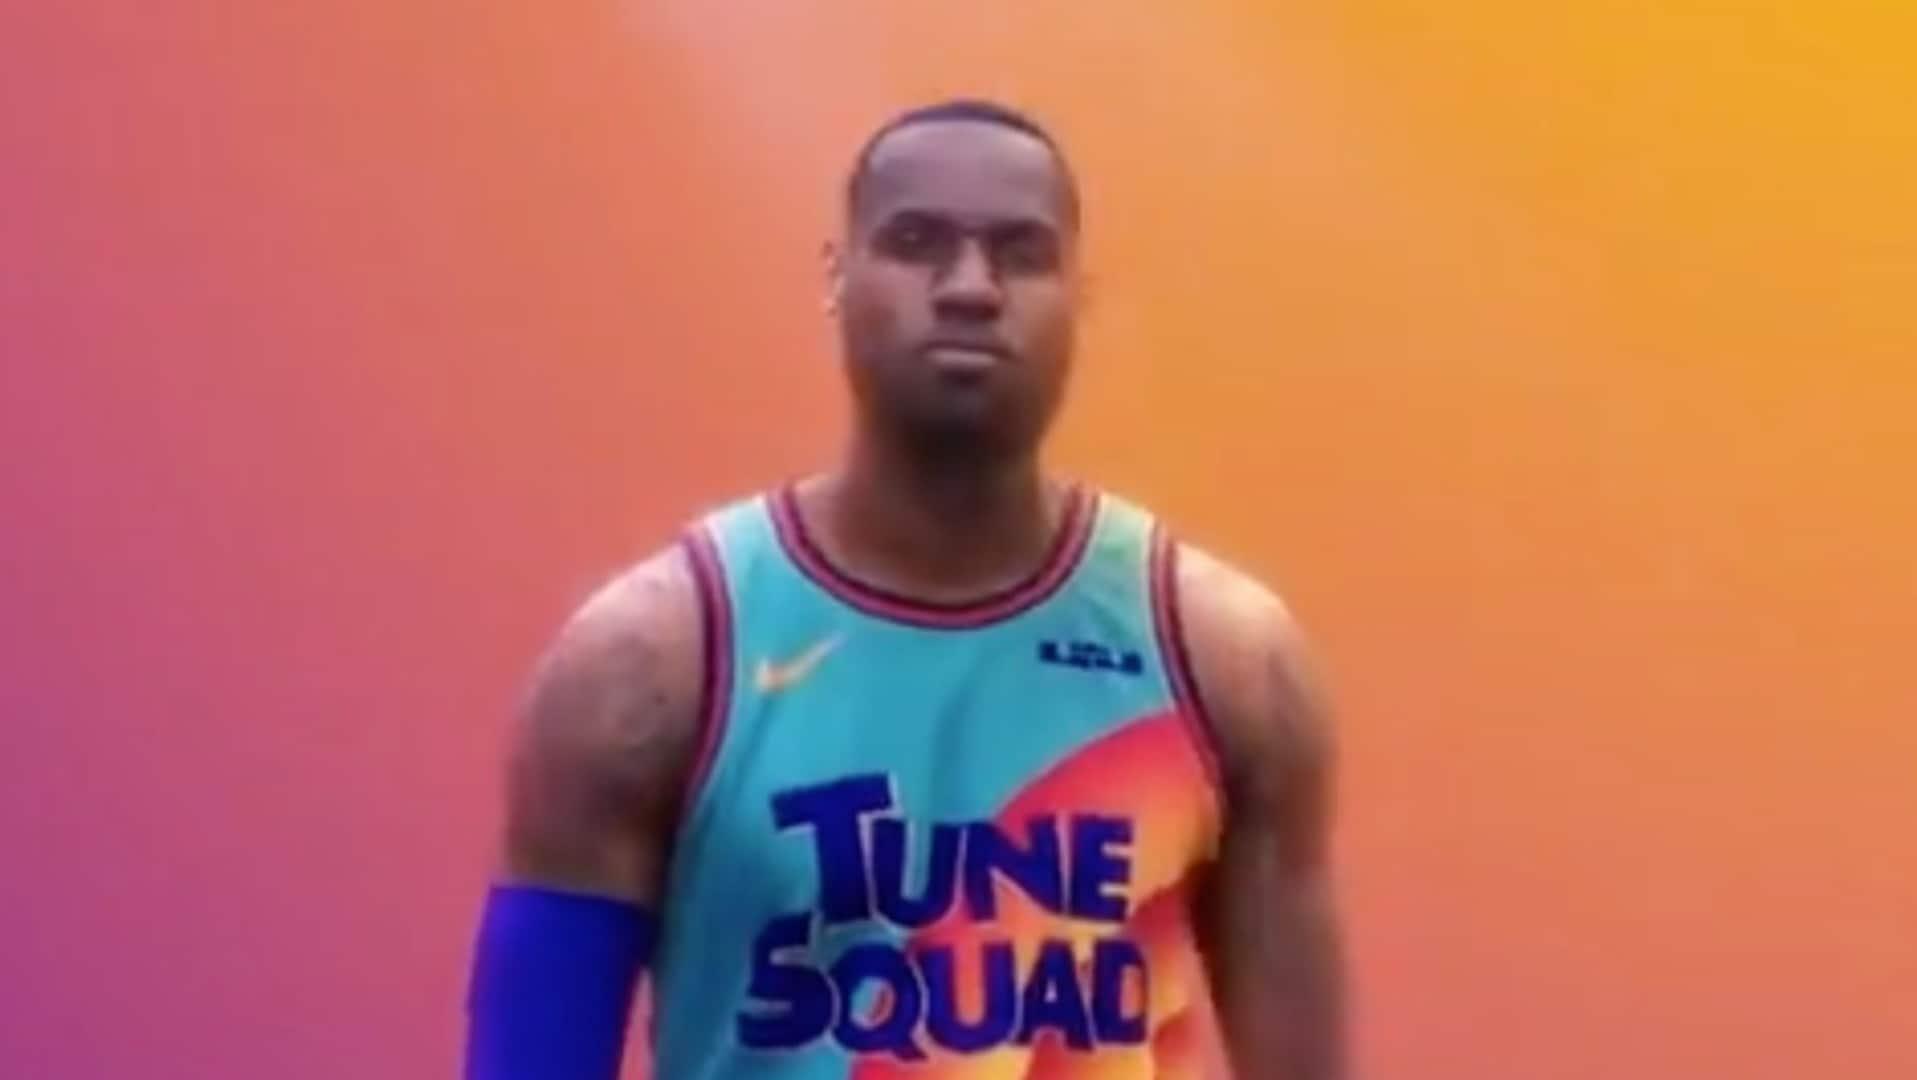 LeBron James drops 'Space Jam' sequel jersey sneak peek